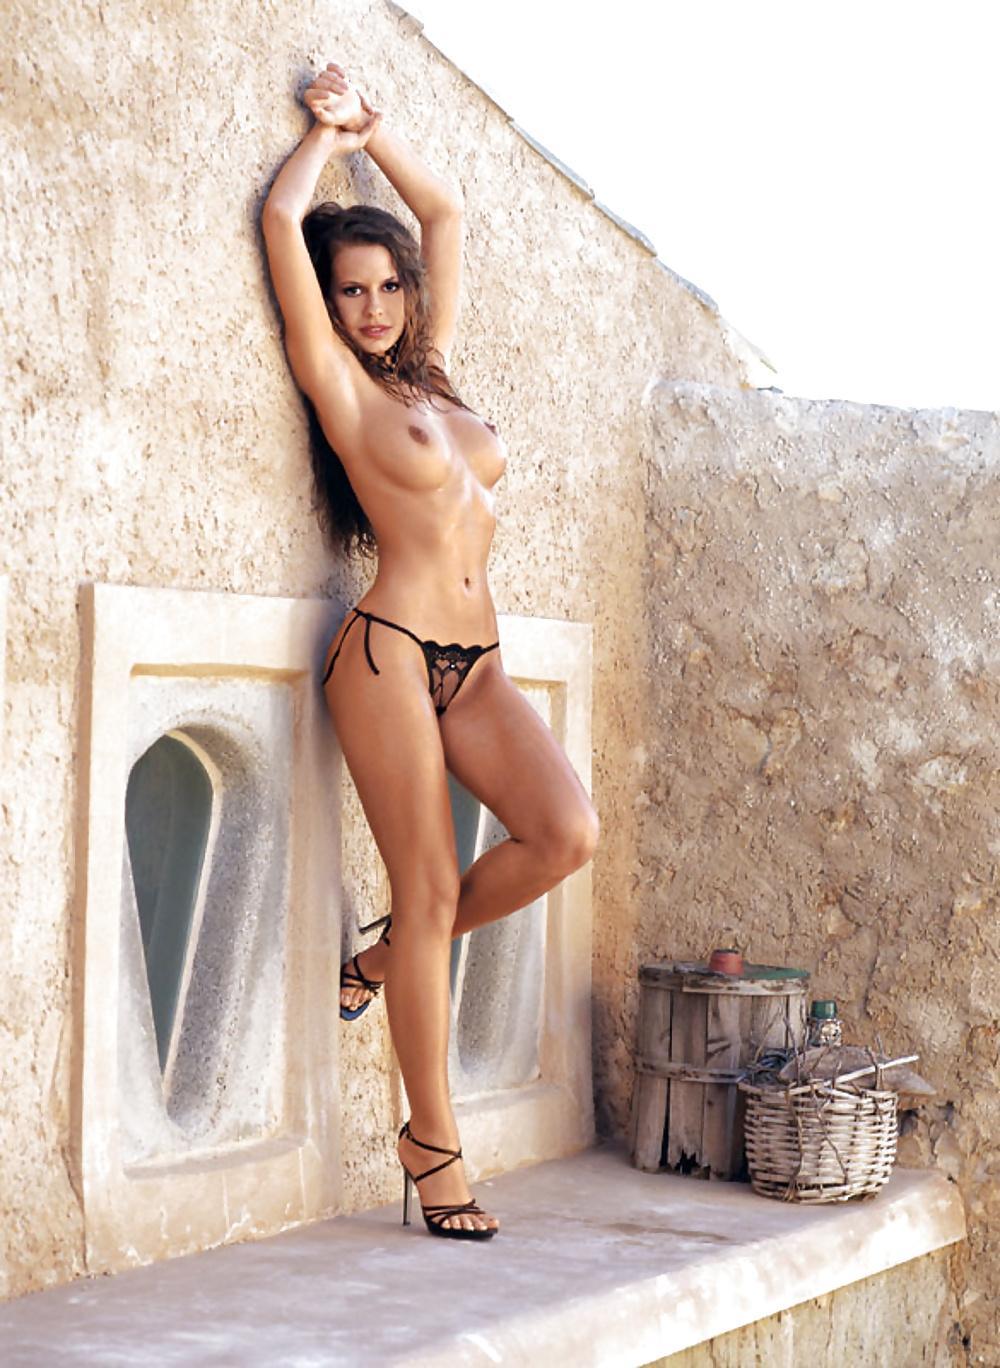 Maureen sauter sexy nude photo autograph reprint print autografo foto autogramm